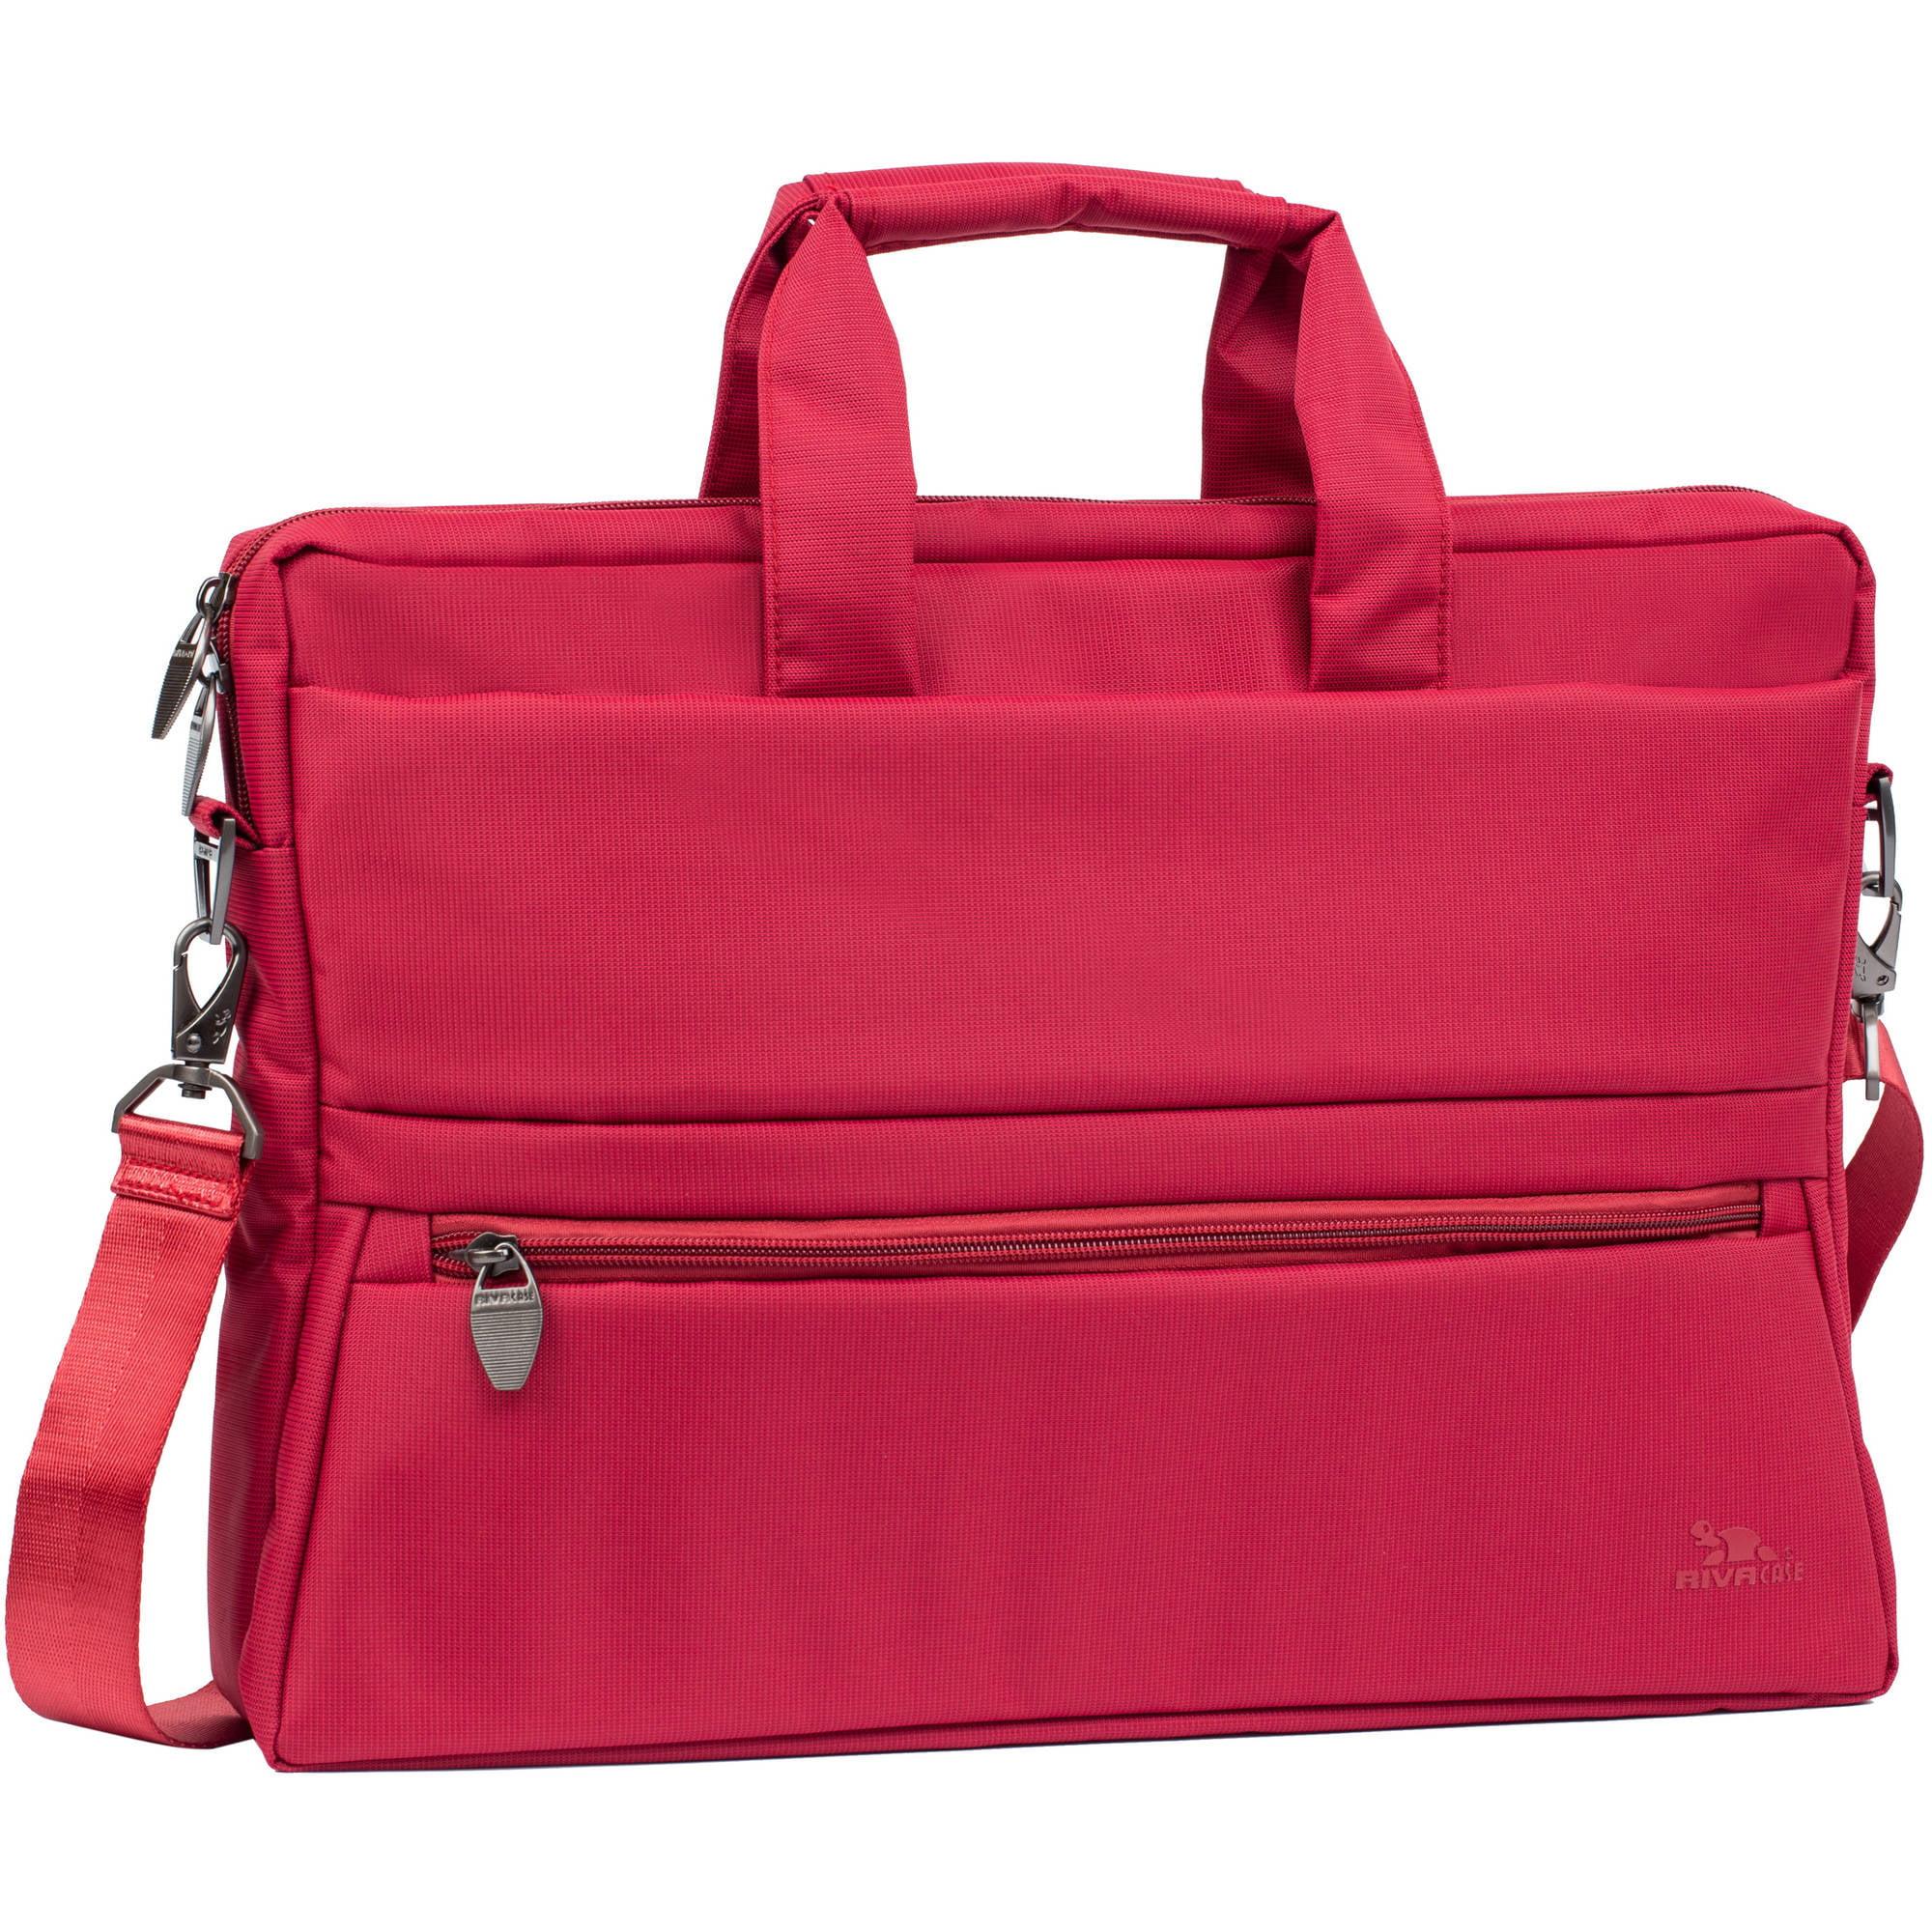 "RIVACASE 15.6"" Laptop Bag 8630, Red"